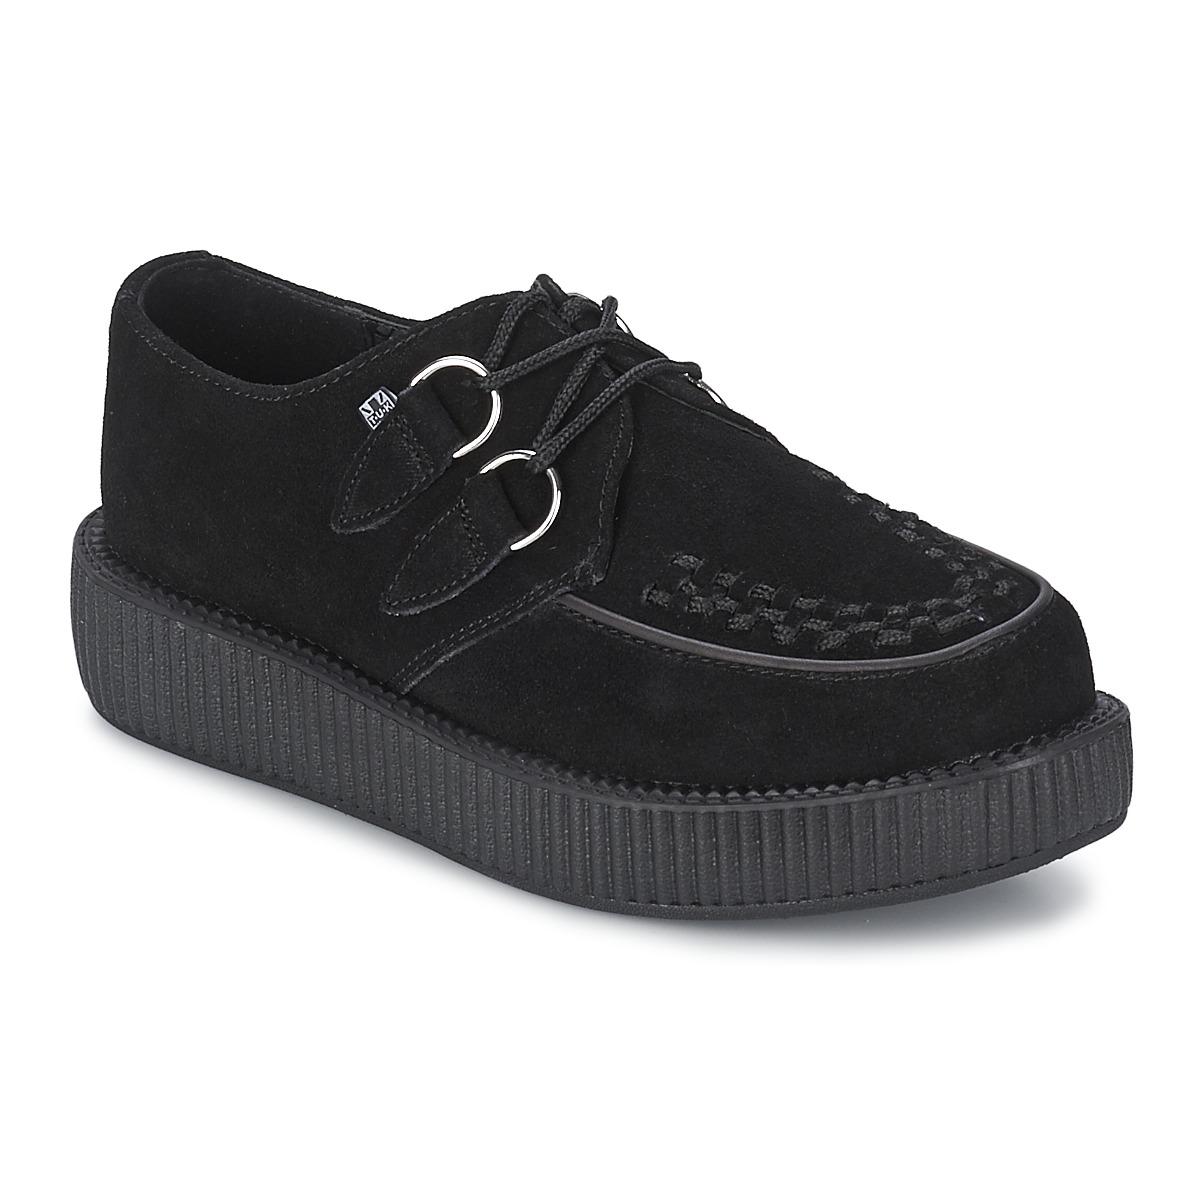 Avec Chaussures Tuk Chaussures Chaussures Livraison Gratuite Avec Livraison Gratuite Tuk Tuk wIxAFvqpH4